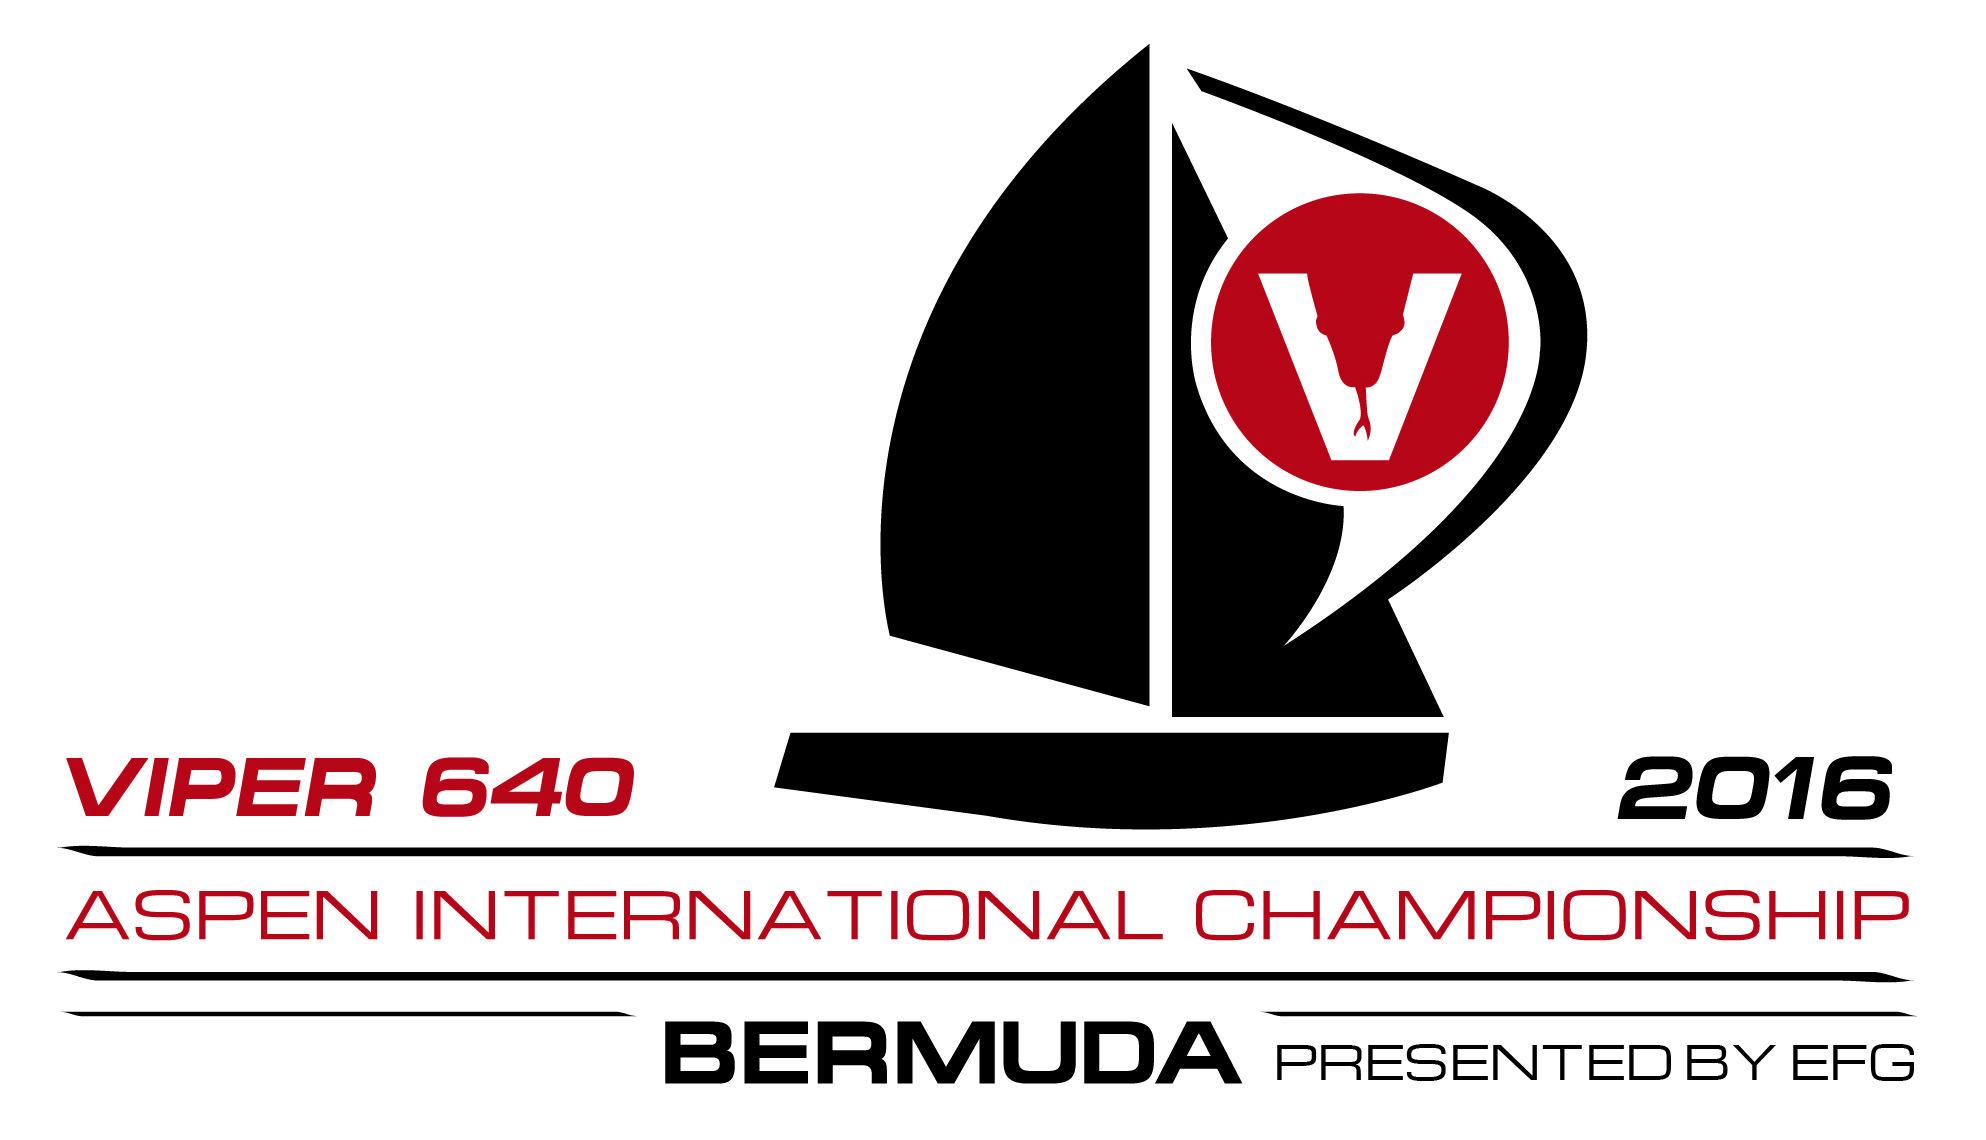 Viper 640 Class - Cardwell Potts and Ted Ferrarone win EFG Viper ...